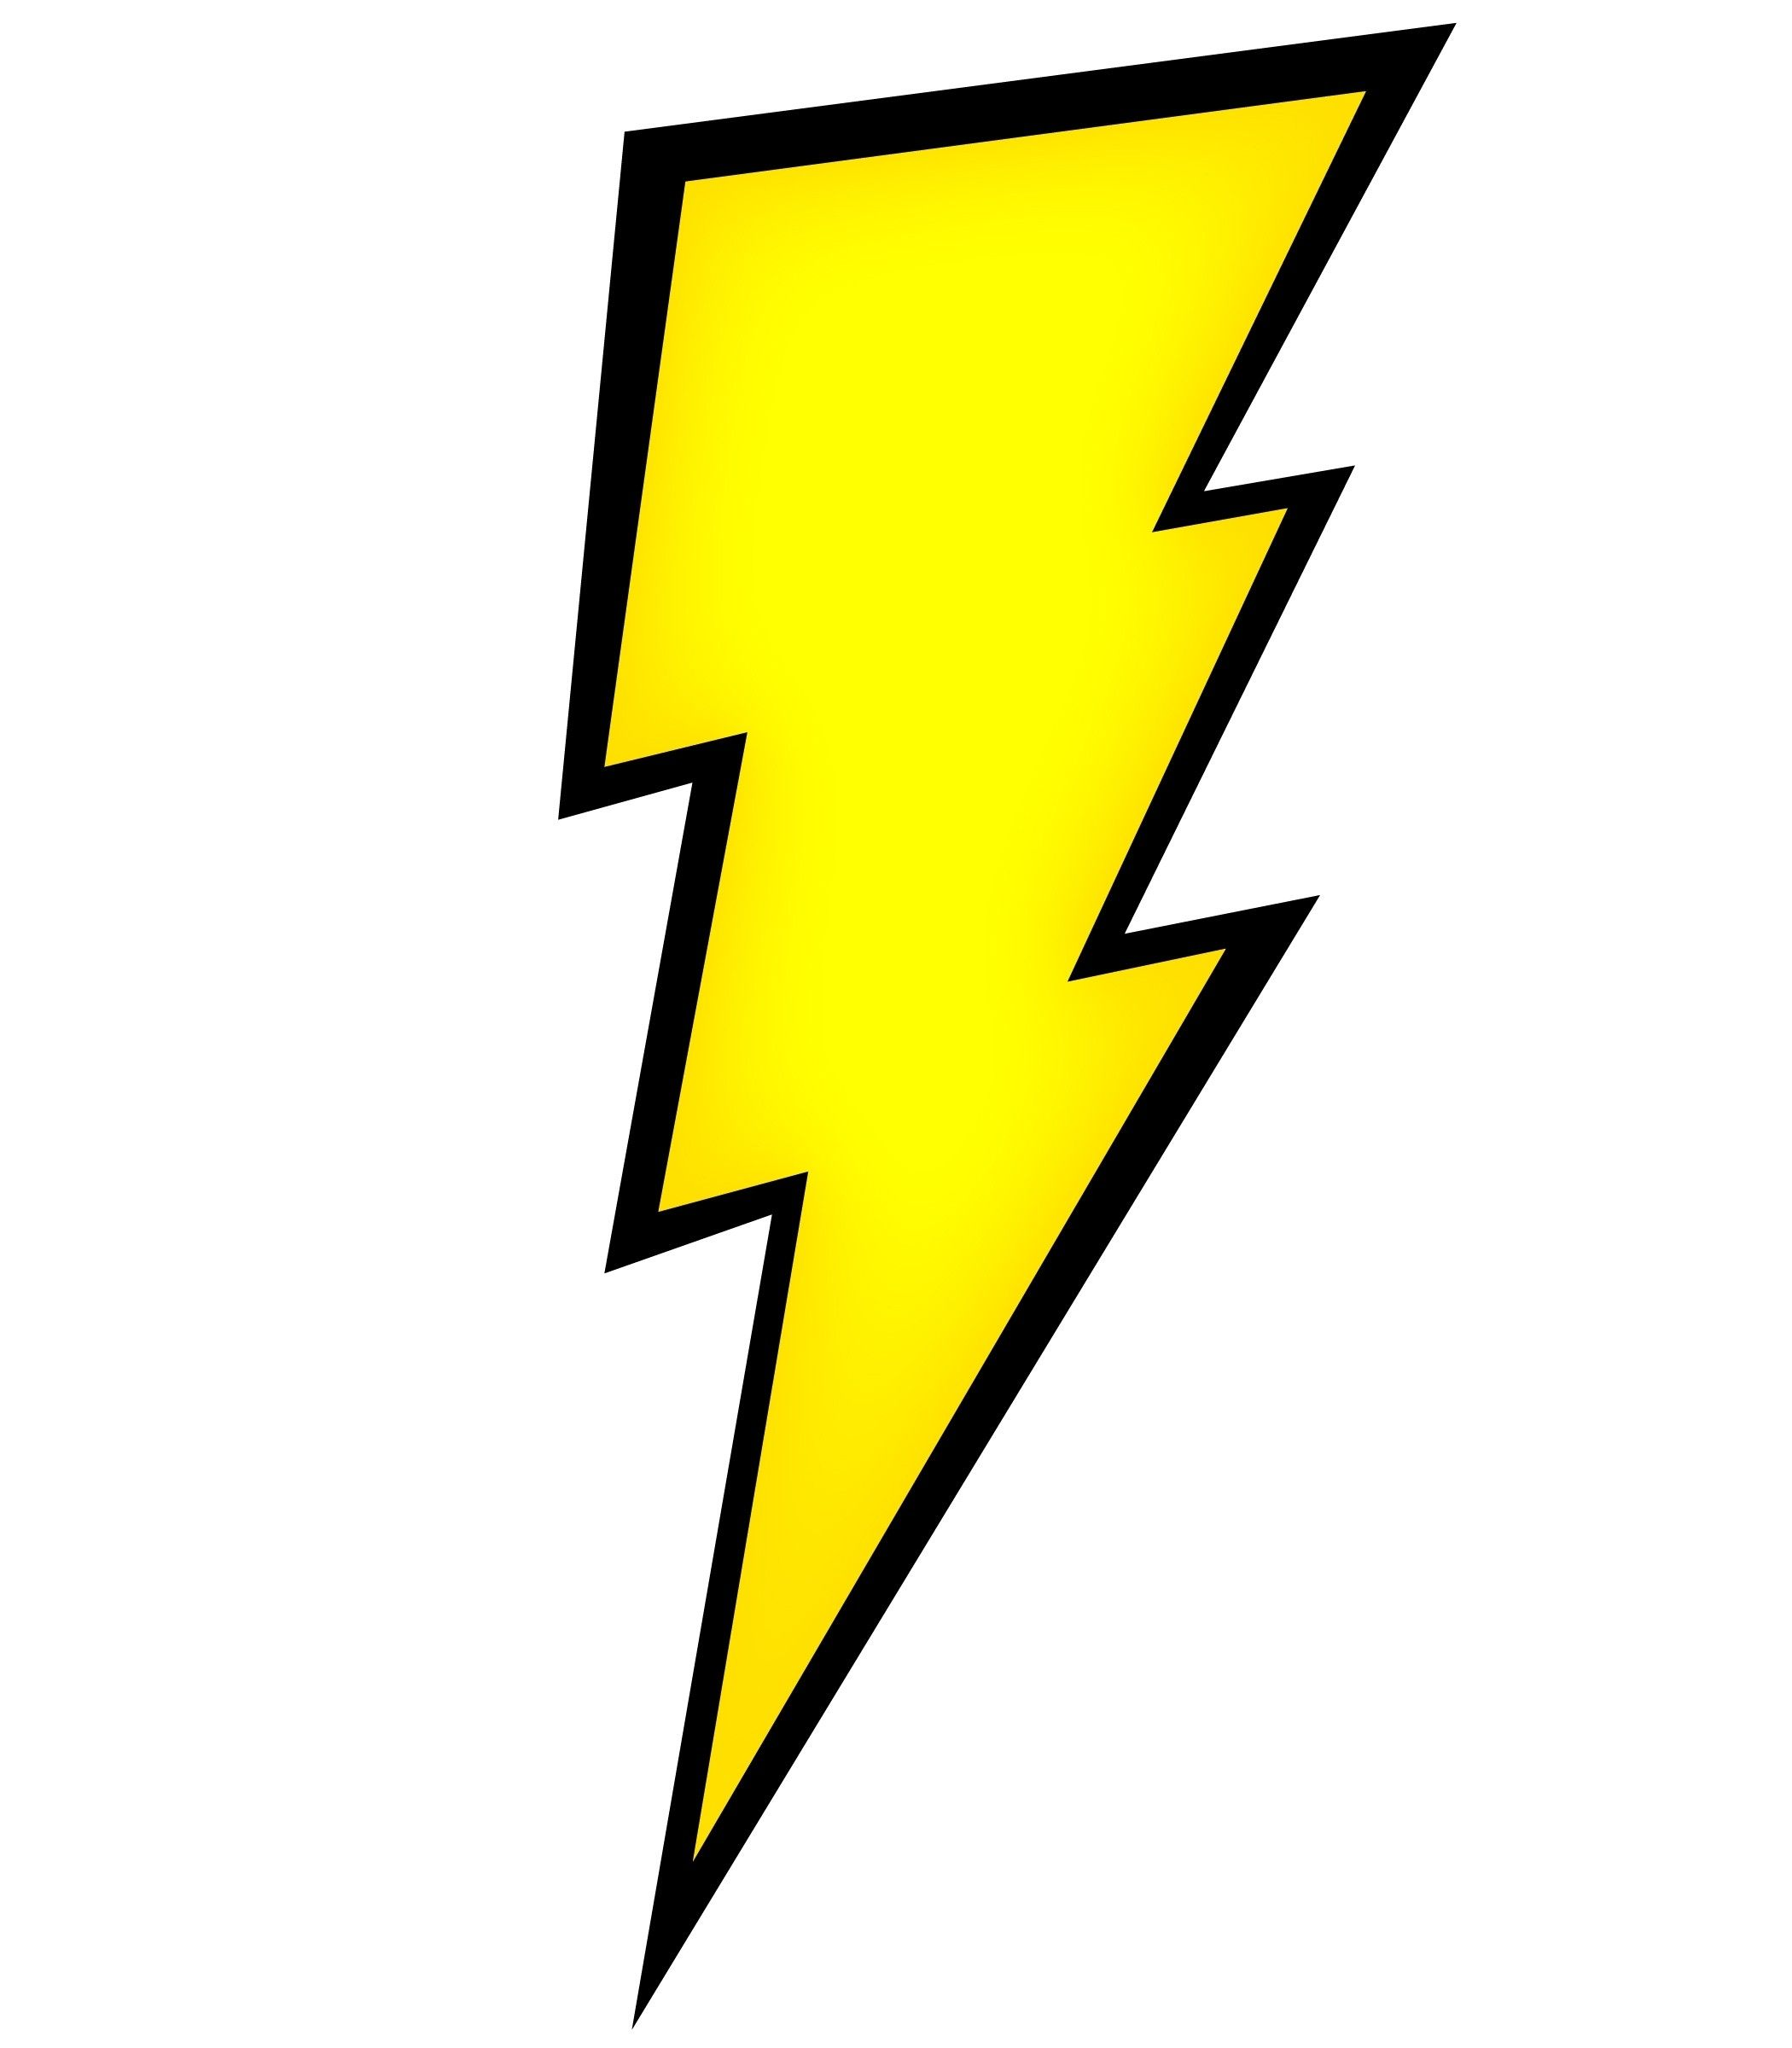 lightning bolt clipart zeus throwing lighting bolt lightning rh illrts co zeus lightning bolt clipart  sc 1 st  alternative clipart design & Zeus Lightning Bolt Clipart - Alternative Clipart Design u2022